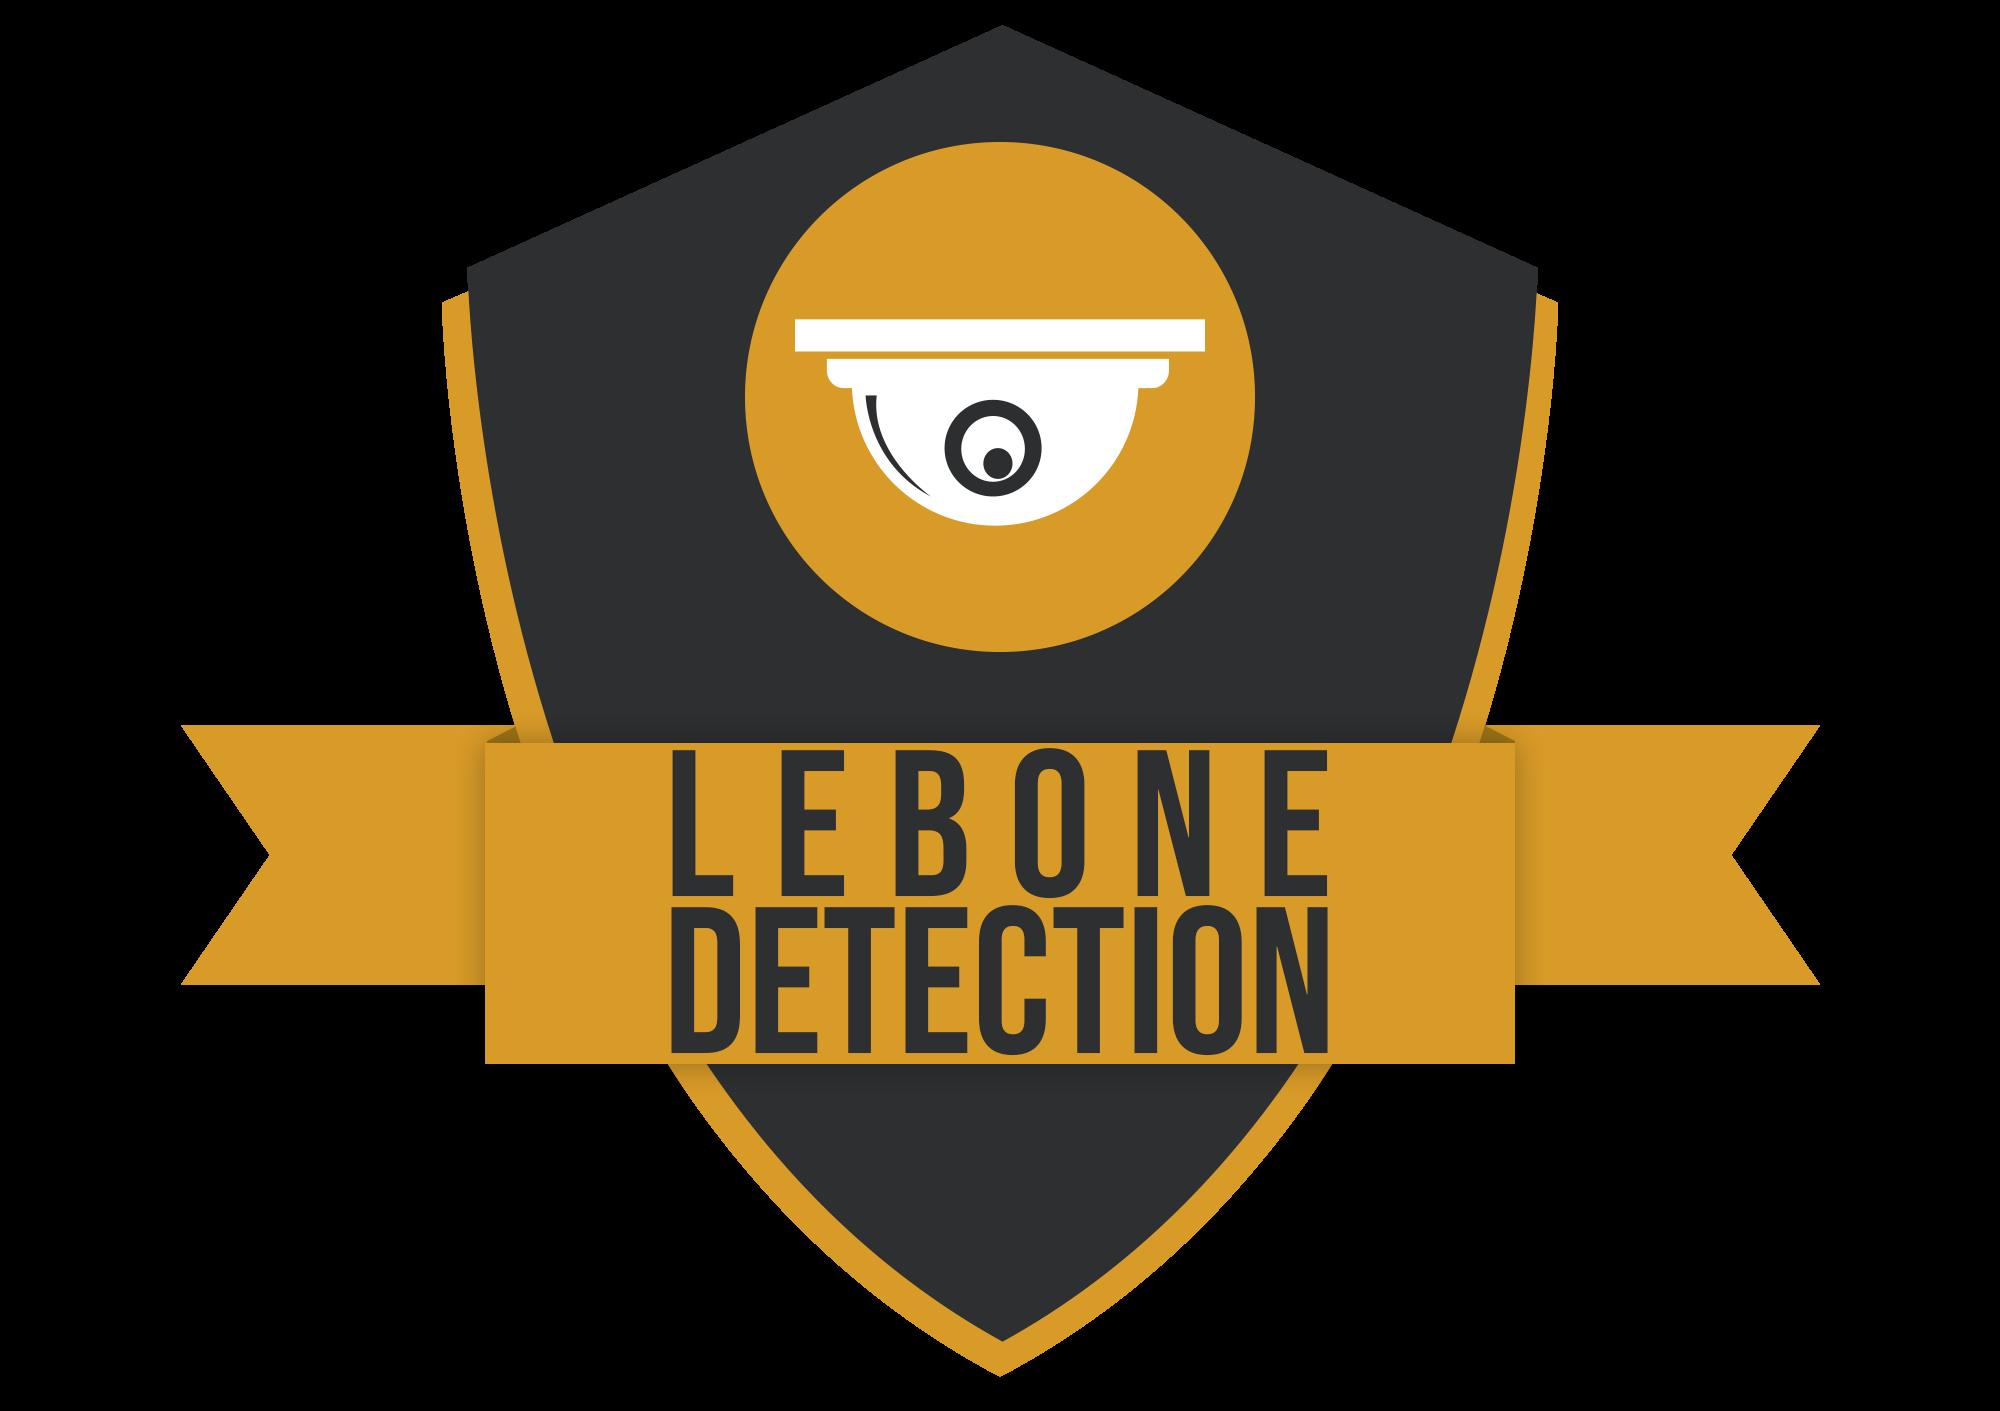 lebone detection